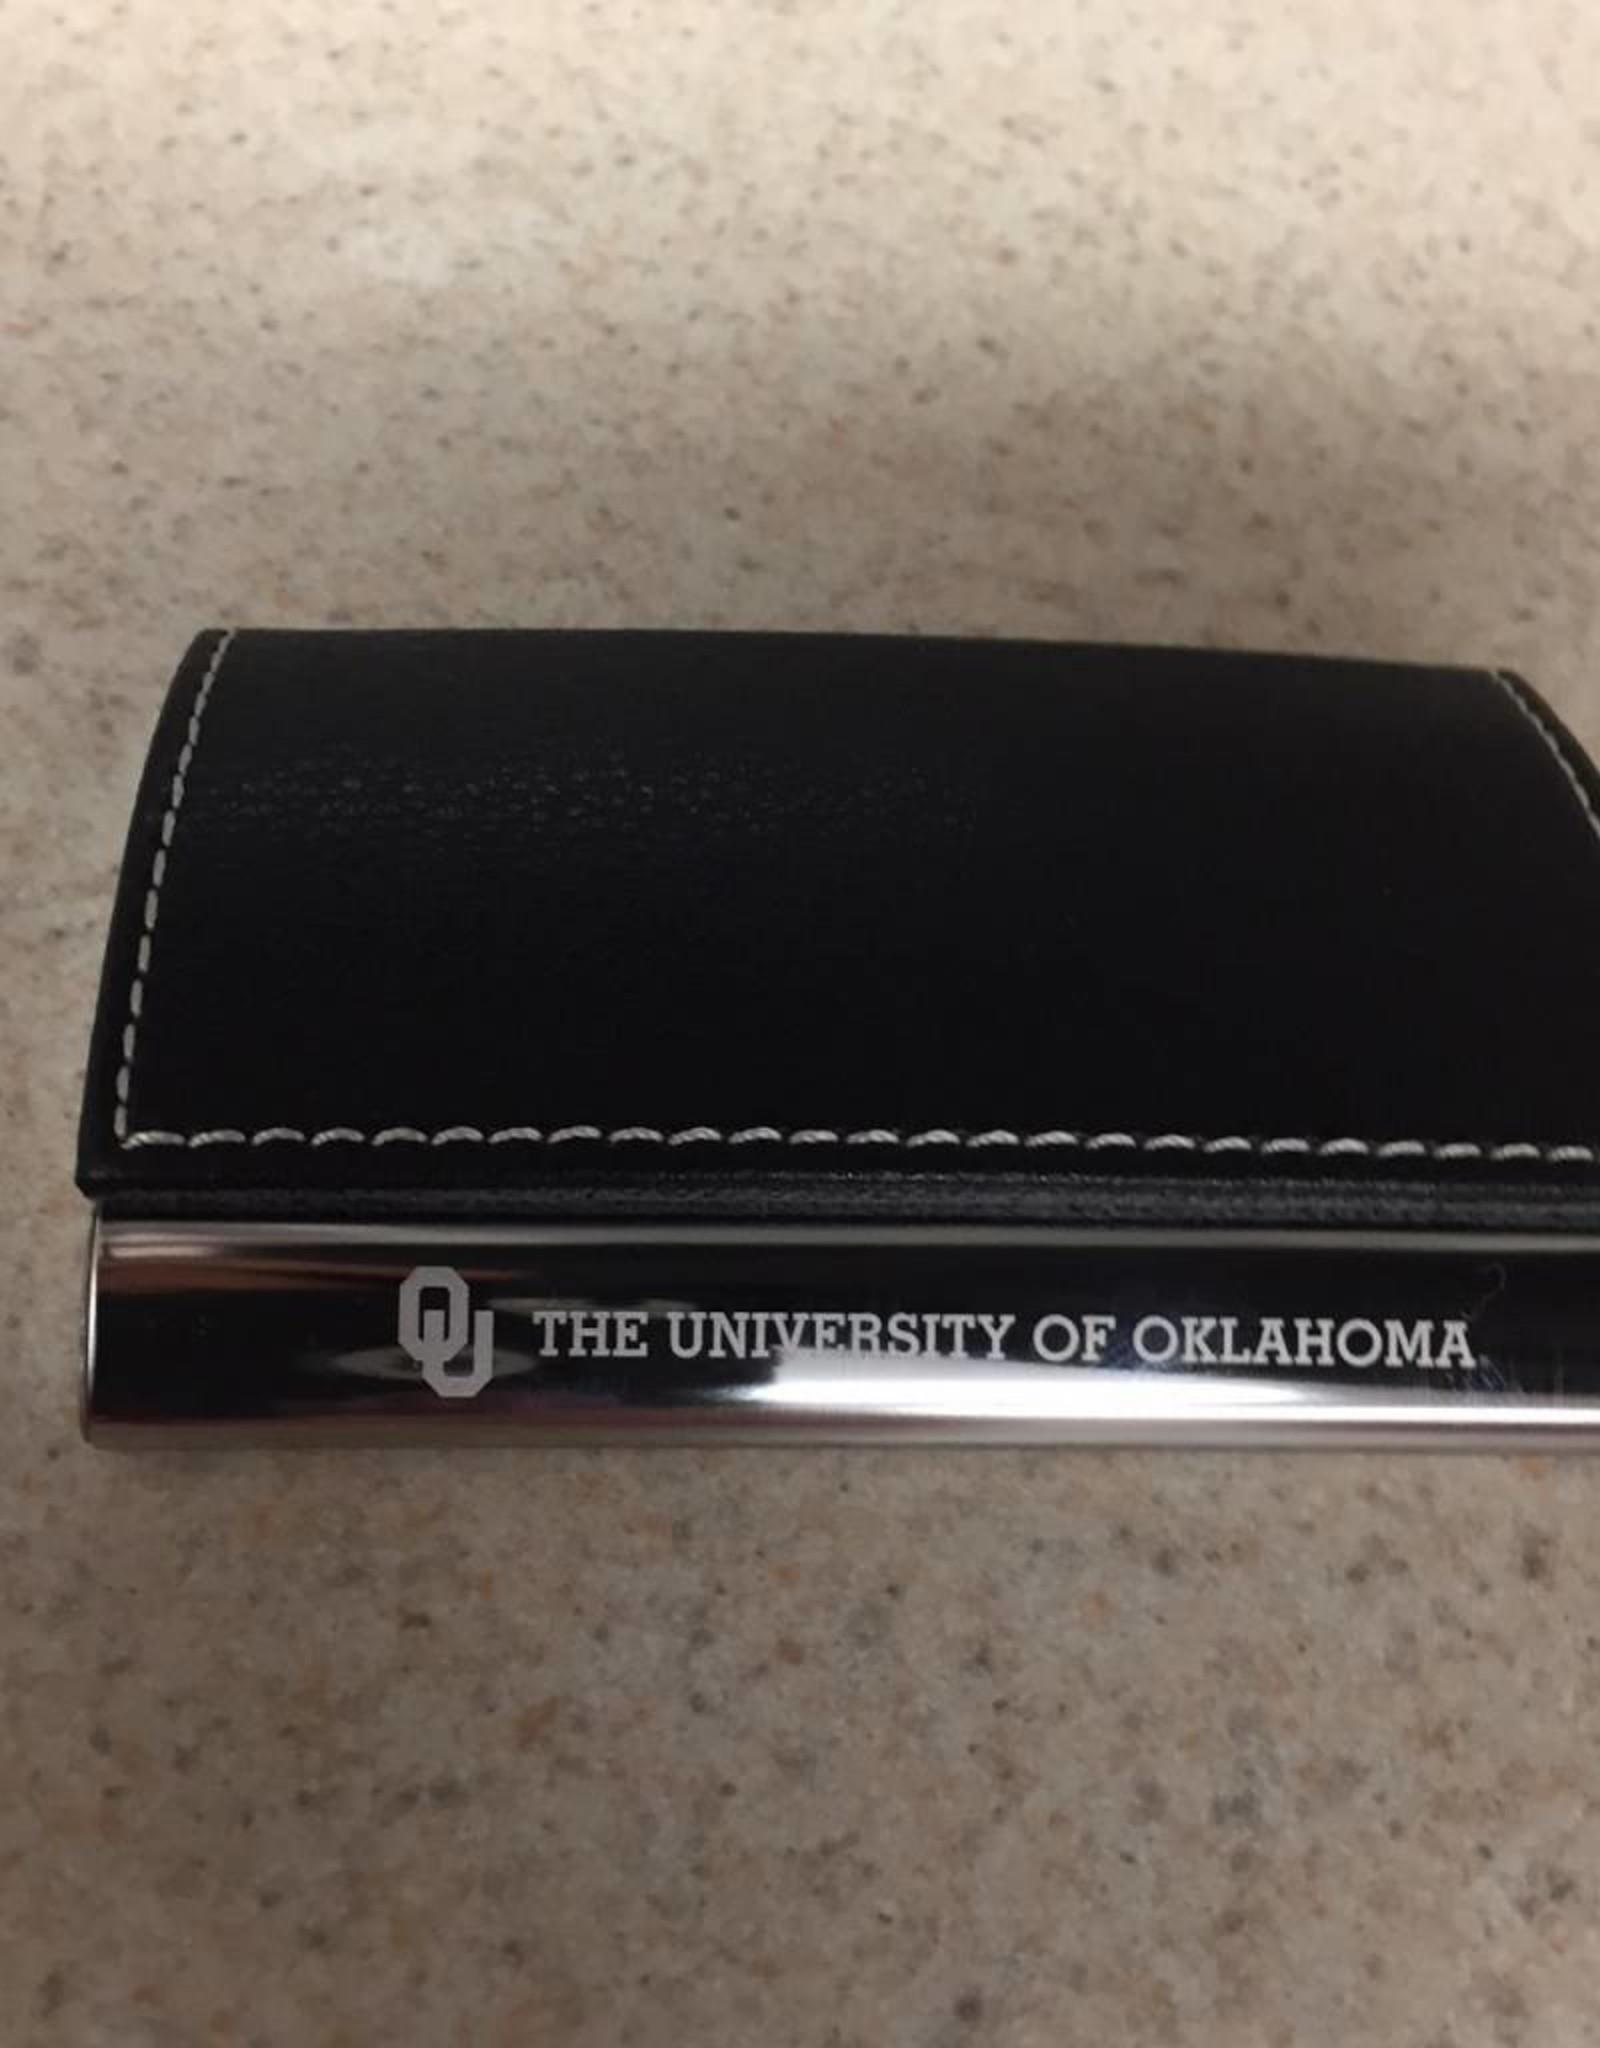 LXG OU The Univ. Of Okla. Black Faux Leather/Chrome Business Card Holder